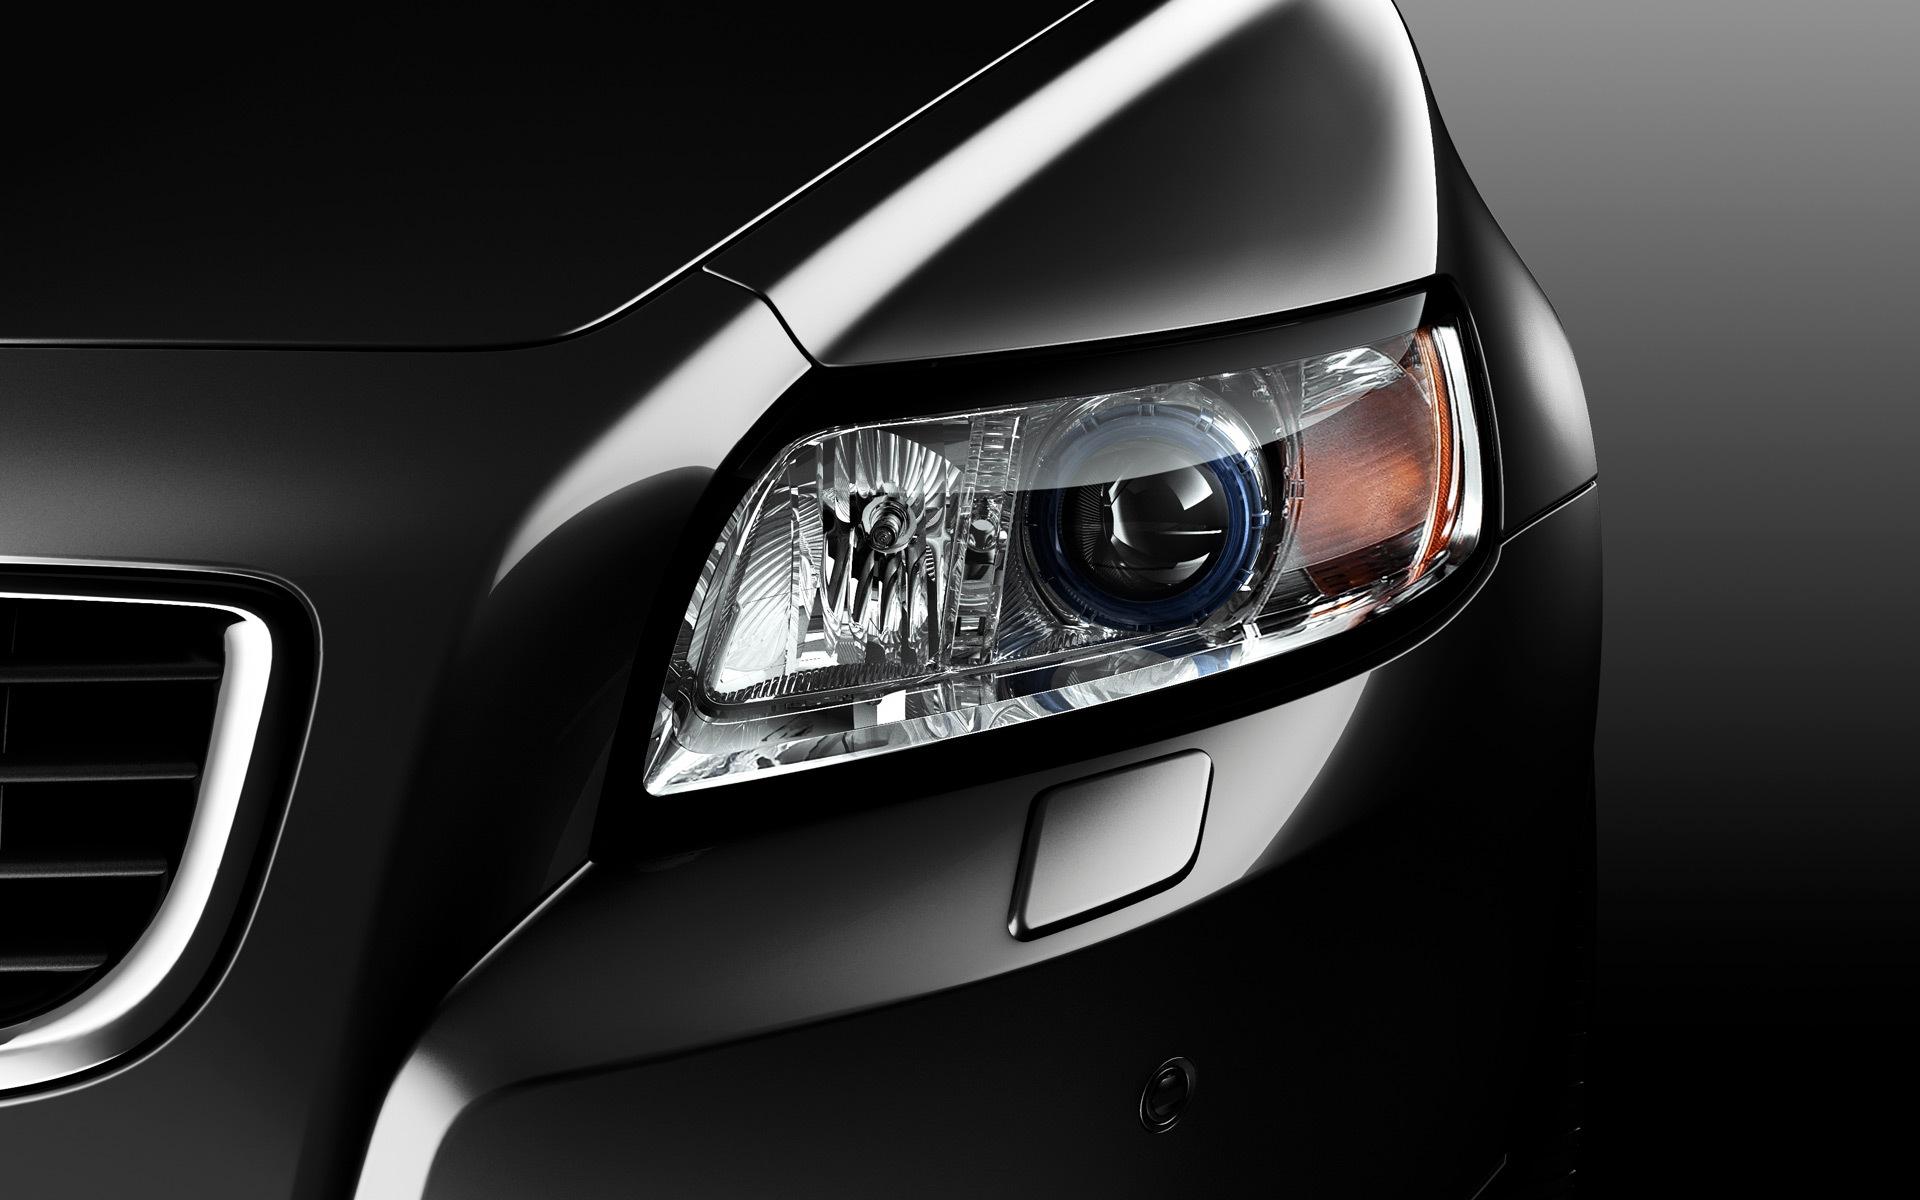 Volvo S40 HD Wallpaper Background Image 1920x1200 ID353915 1920x1200